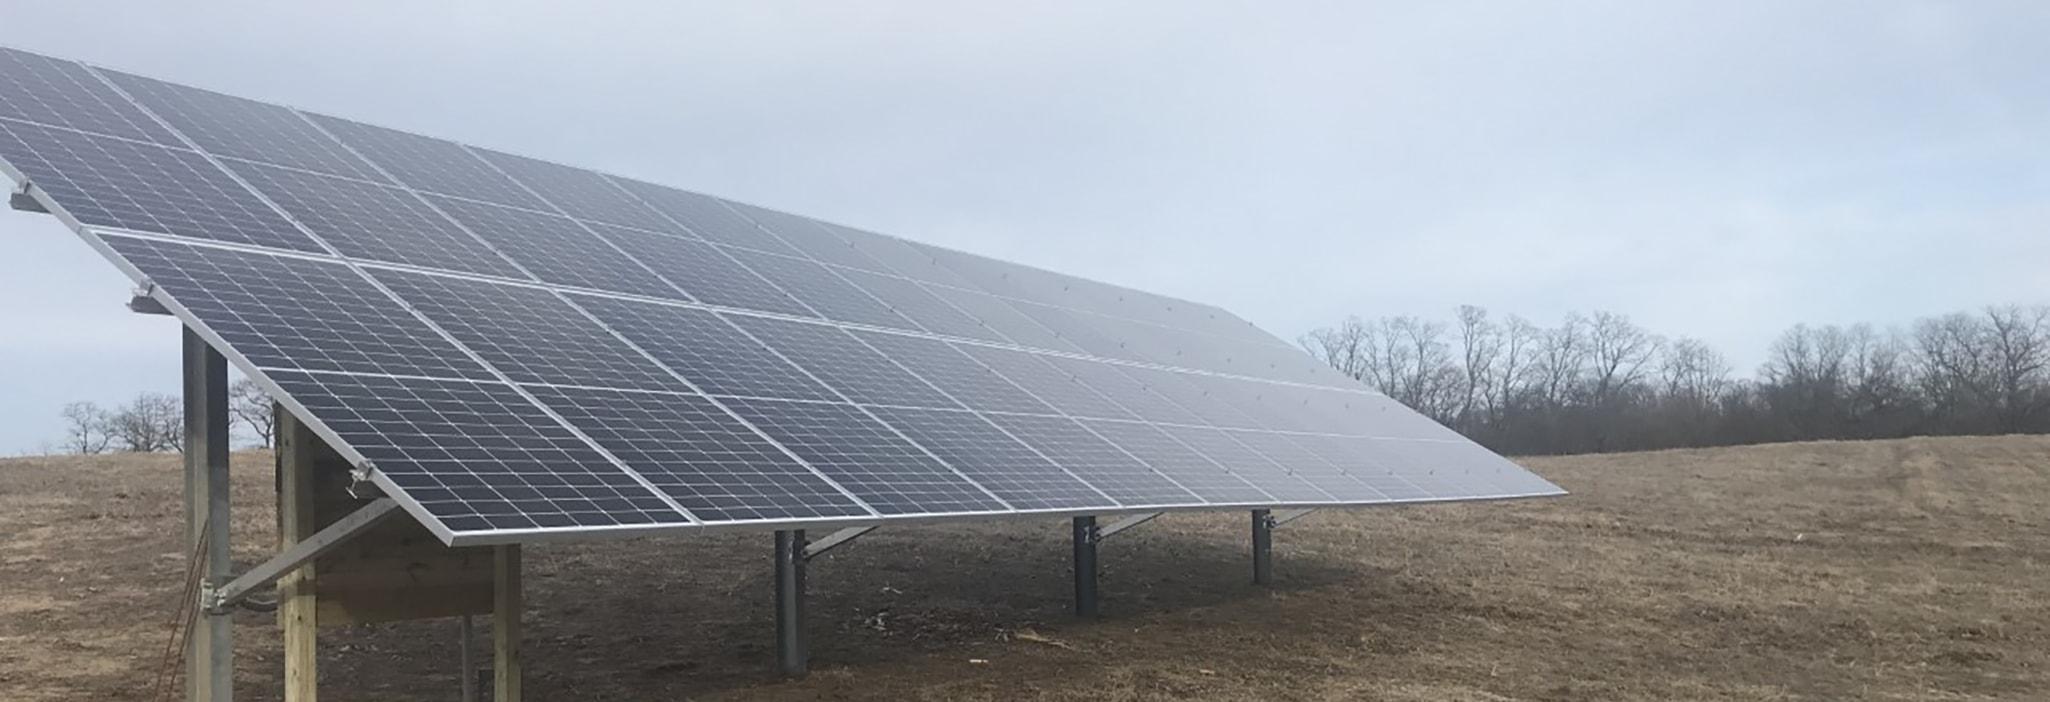 glass solar panels in an Illinois field